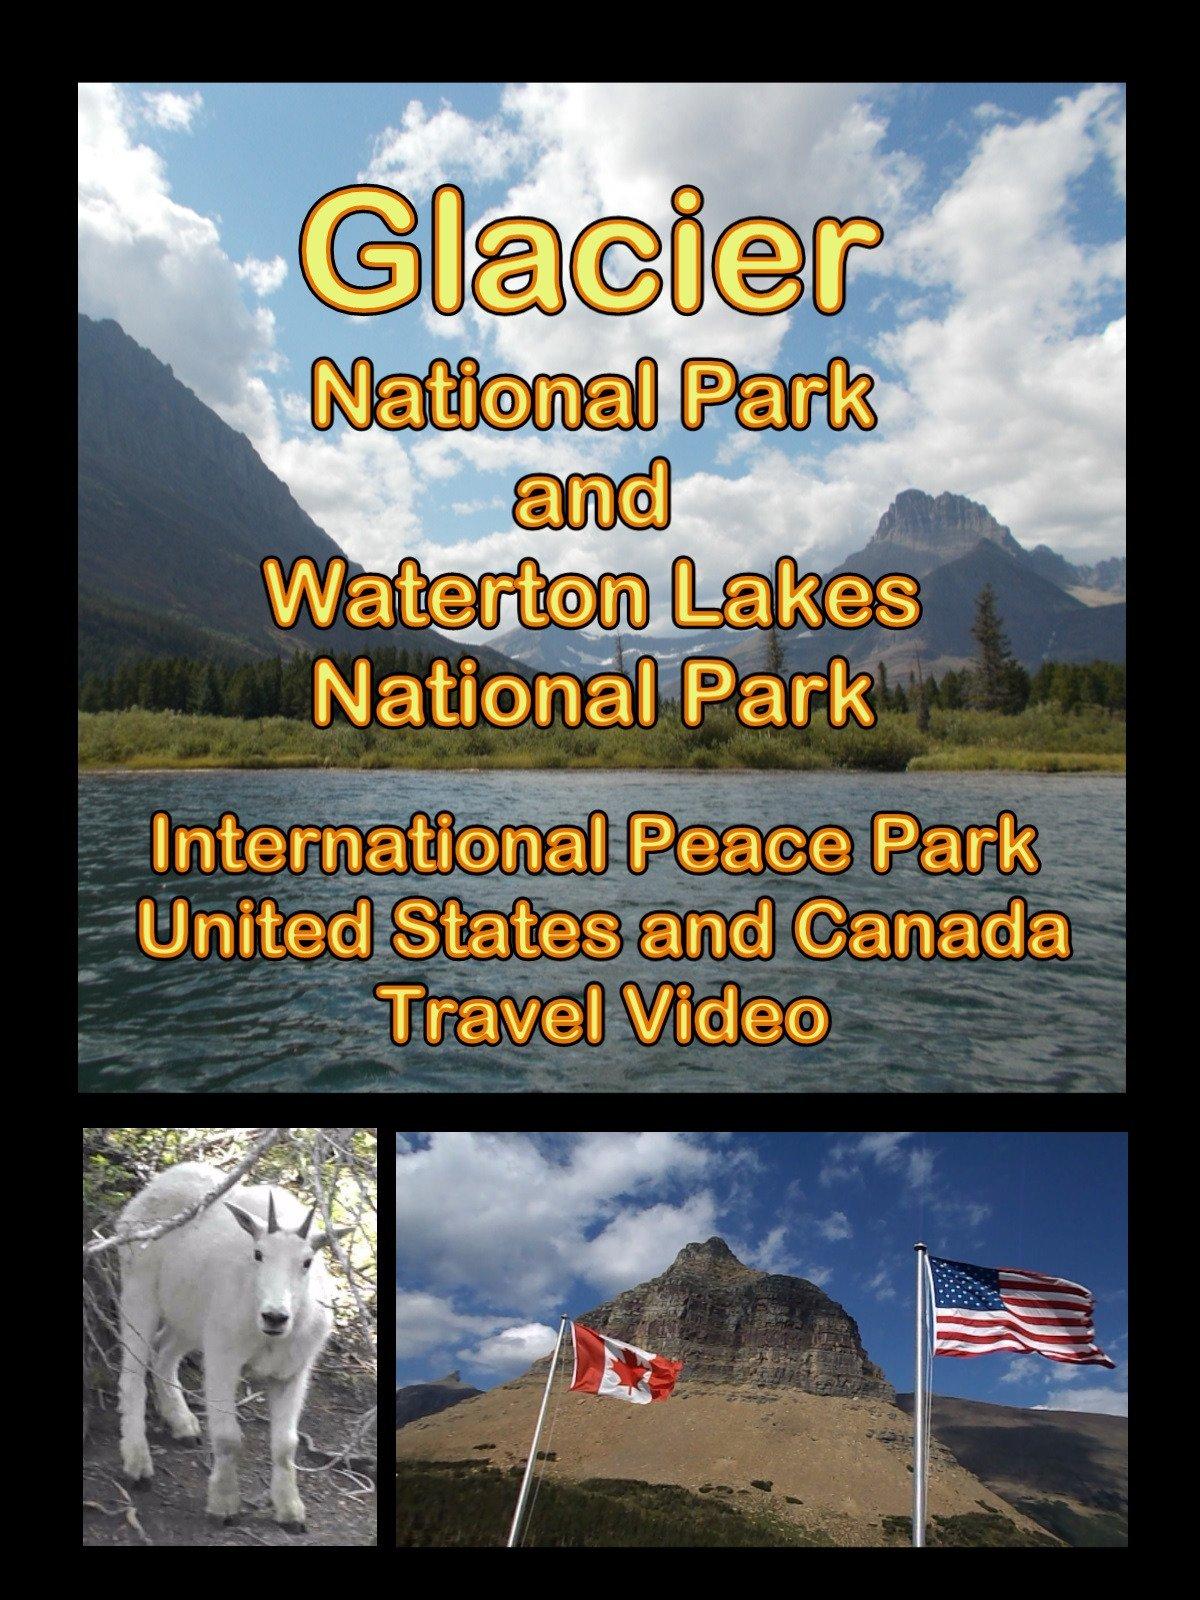 Glacier National Park and Waterton Lakes National Park